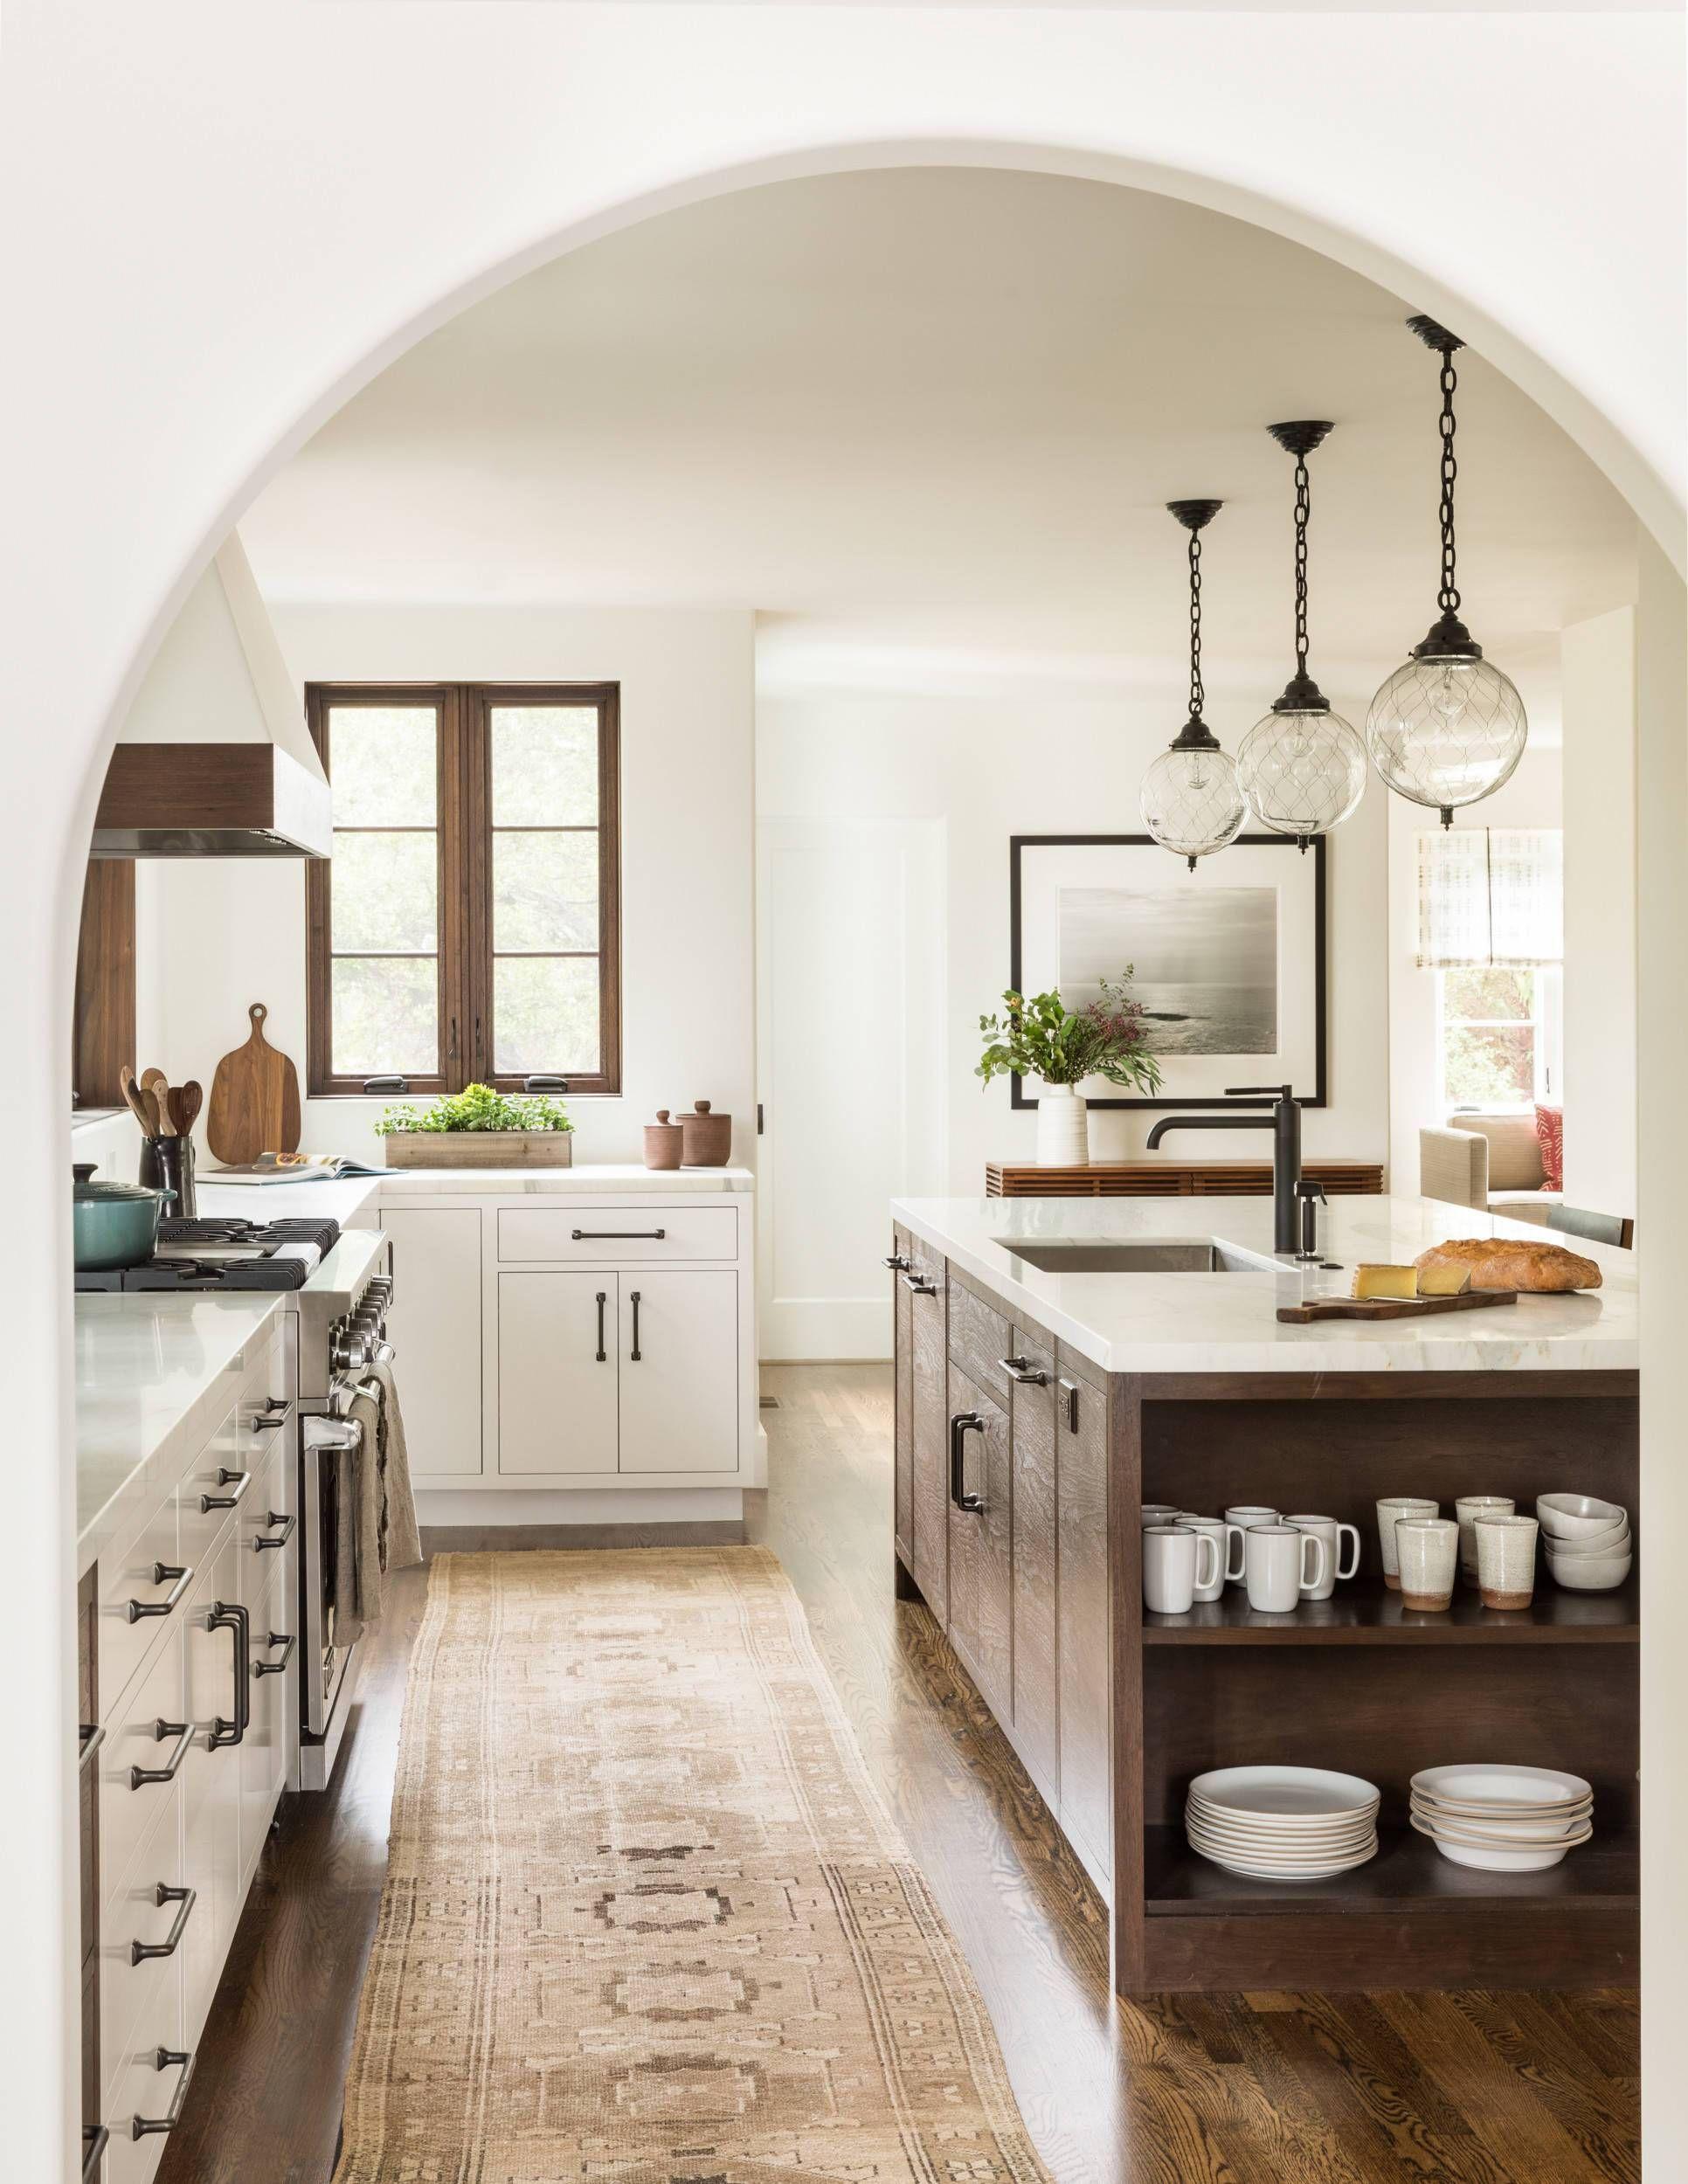 Pin von Leilani Corallo Miraglia auf Kitchens | Pinterest